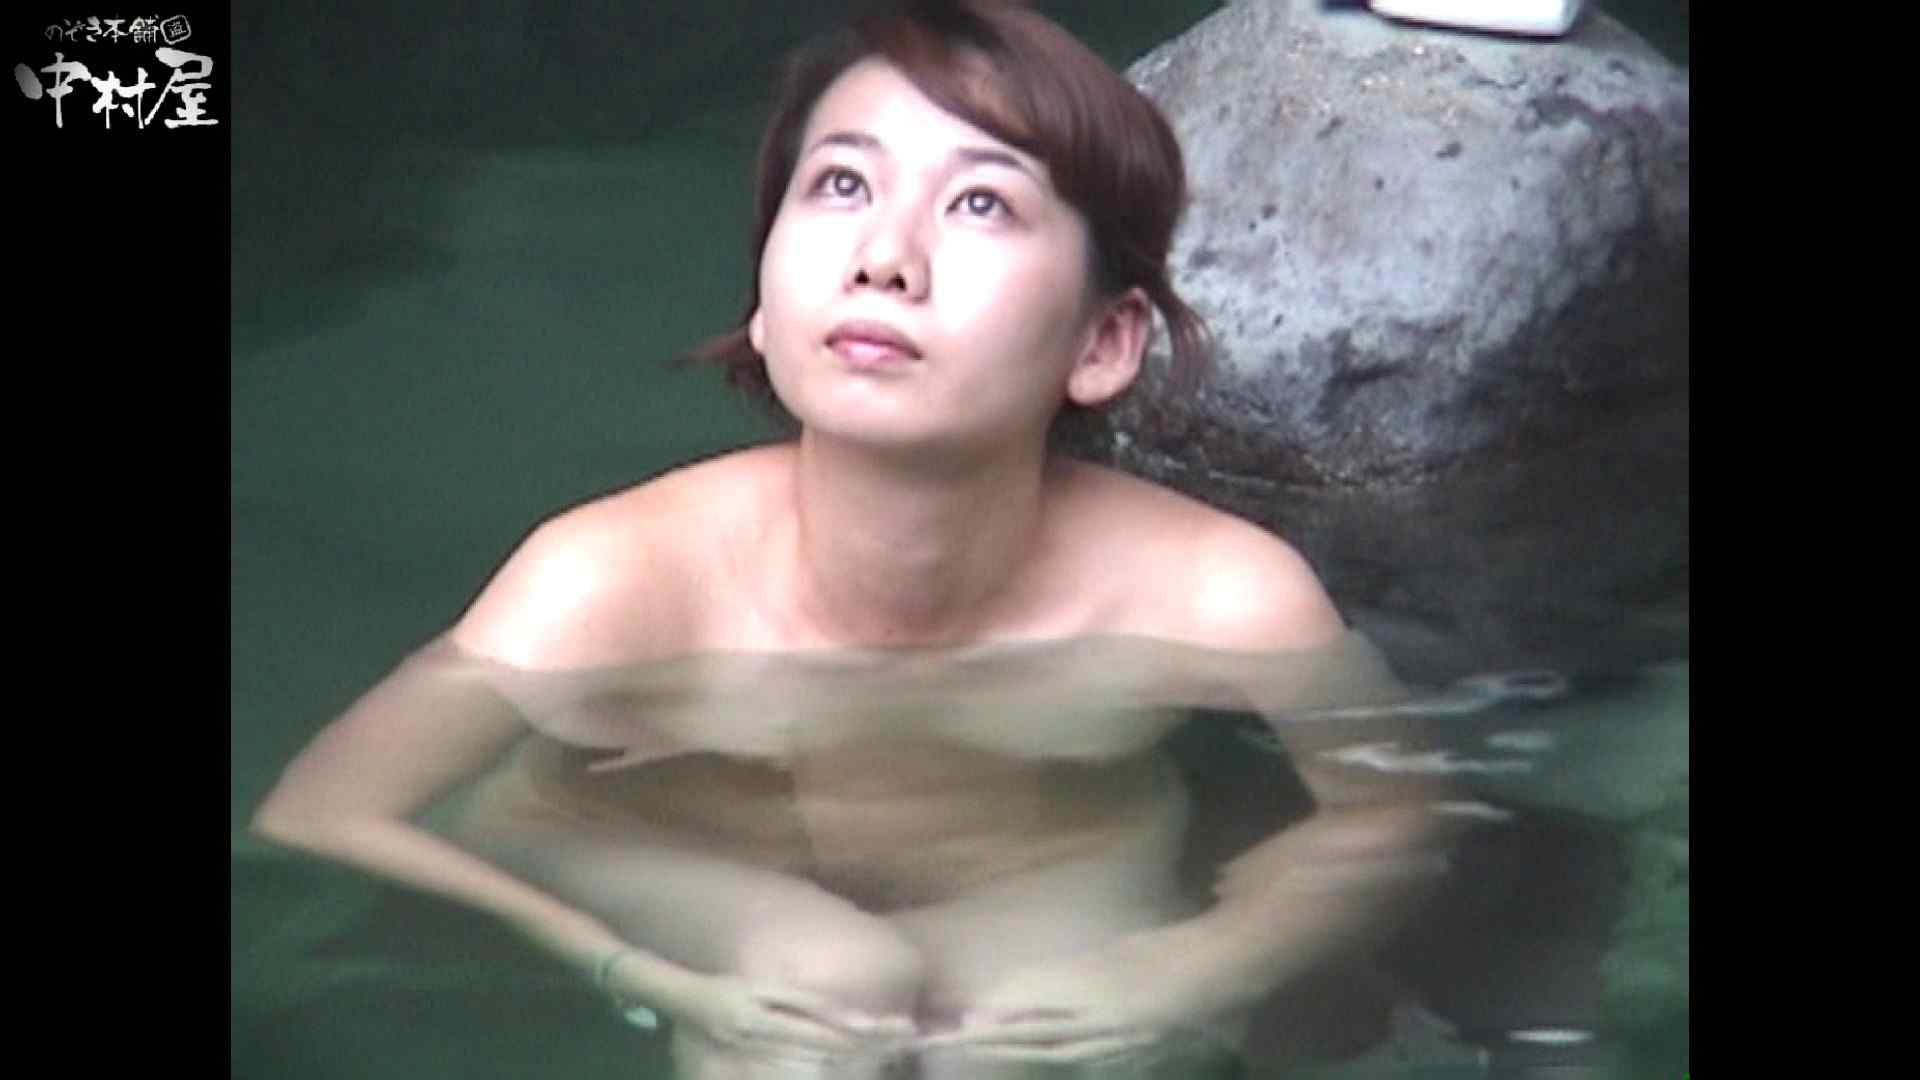 Aquaな露天風呂Vol.951 盗撮映像  93Pix 41